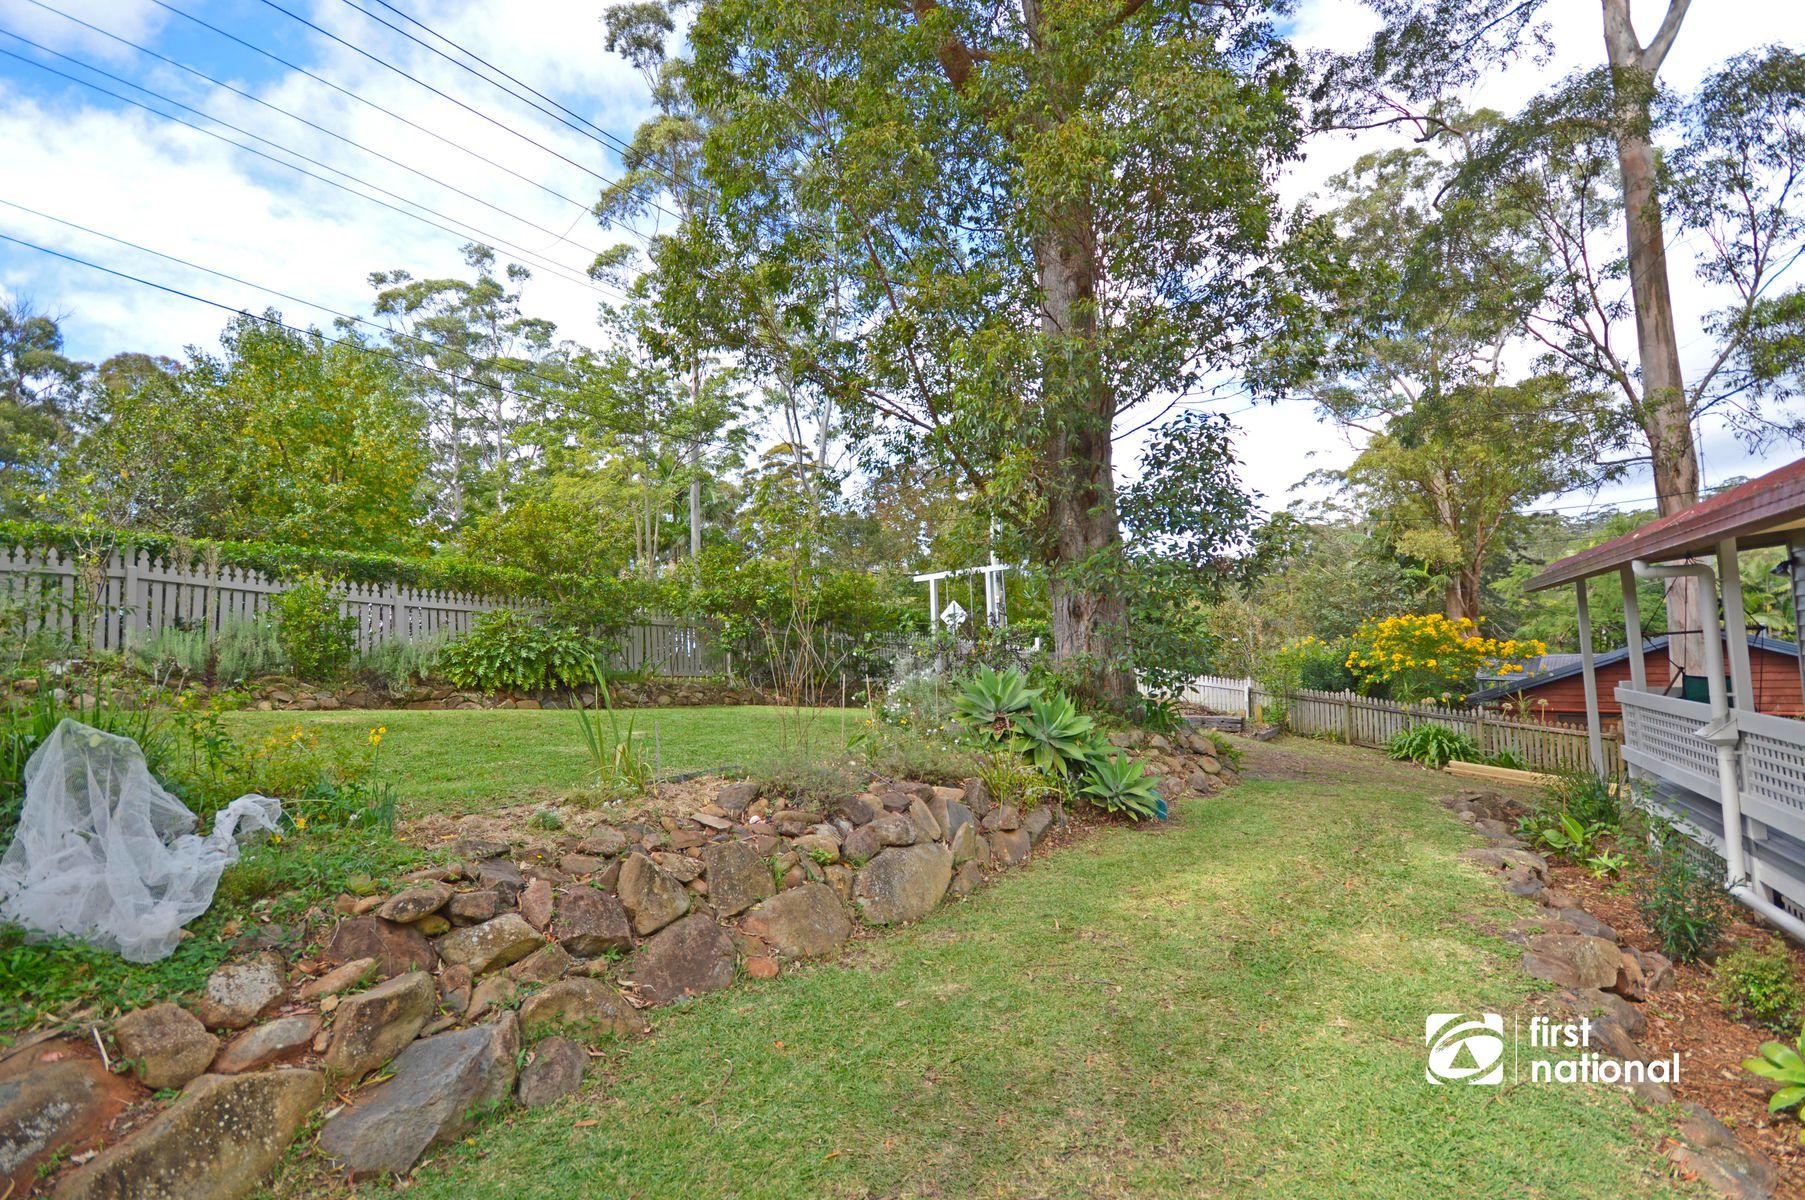 54 Kinabalu Drive, Tamborine Mountain, QLD 4272